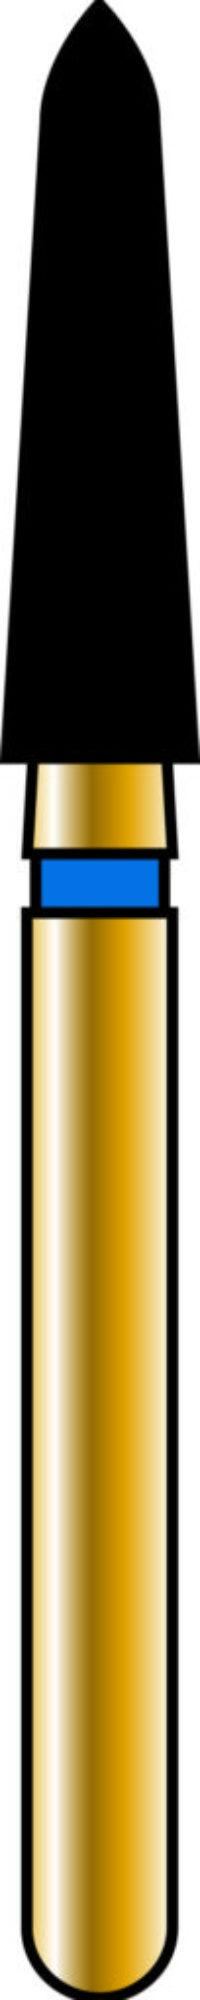 Pointed Taper 21-8mm Gold Diamond Bur